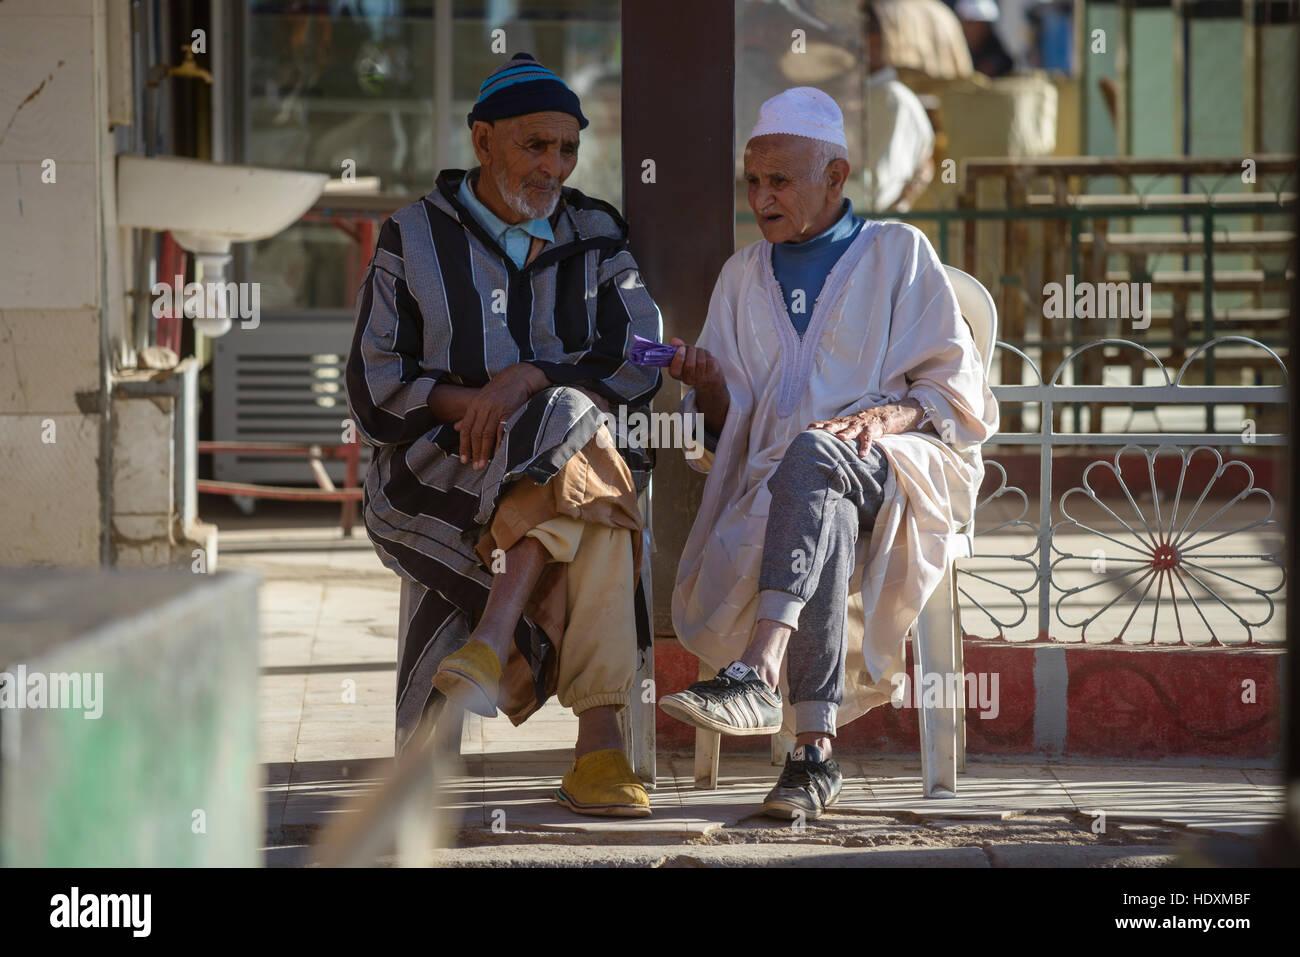 Les hommes marocains, Maroc Photo Stock